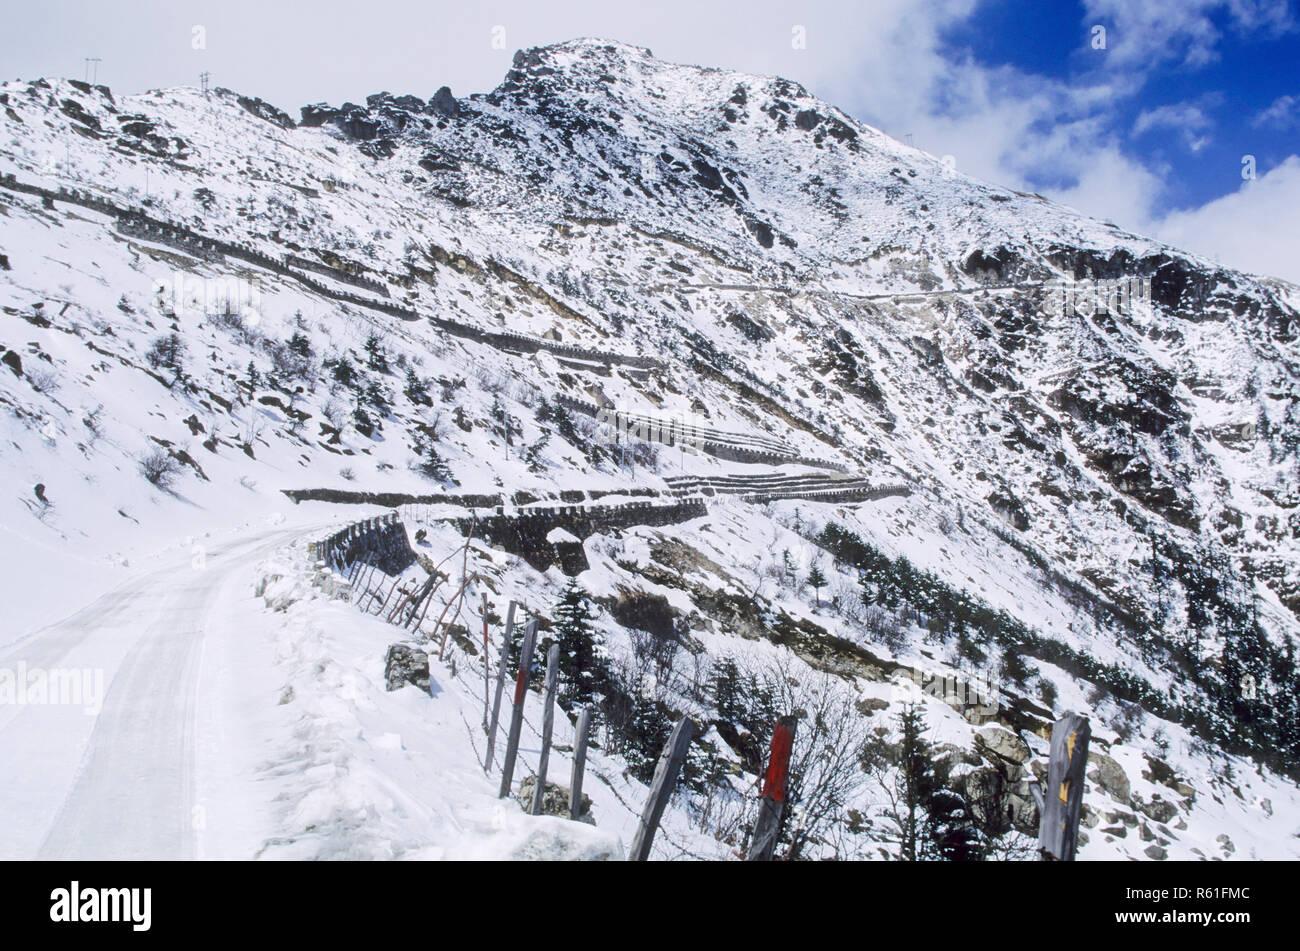 Sela Pass 14, 000 ft., Arunachal Pradesh, India - Stock Image